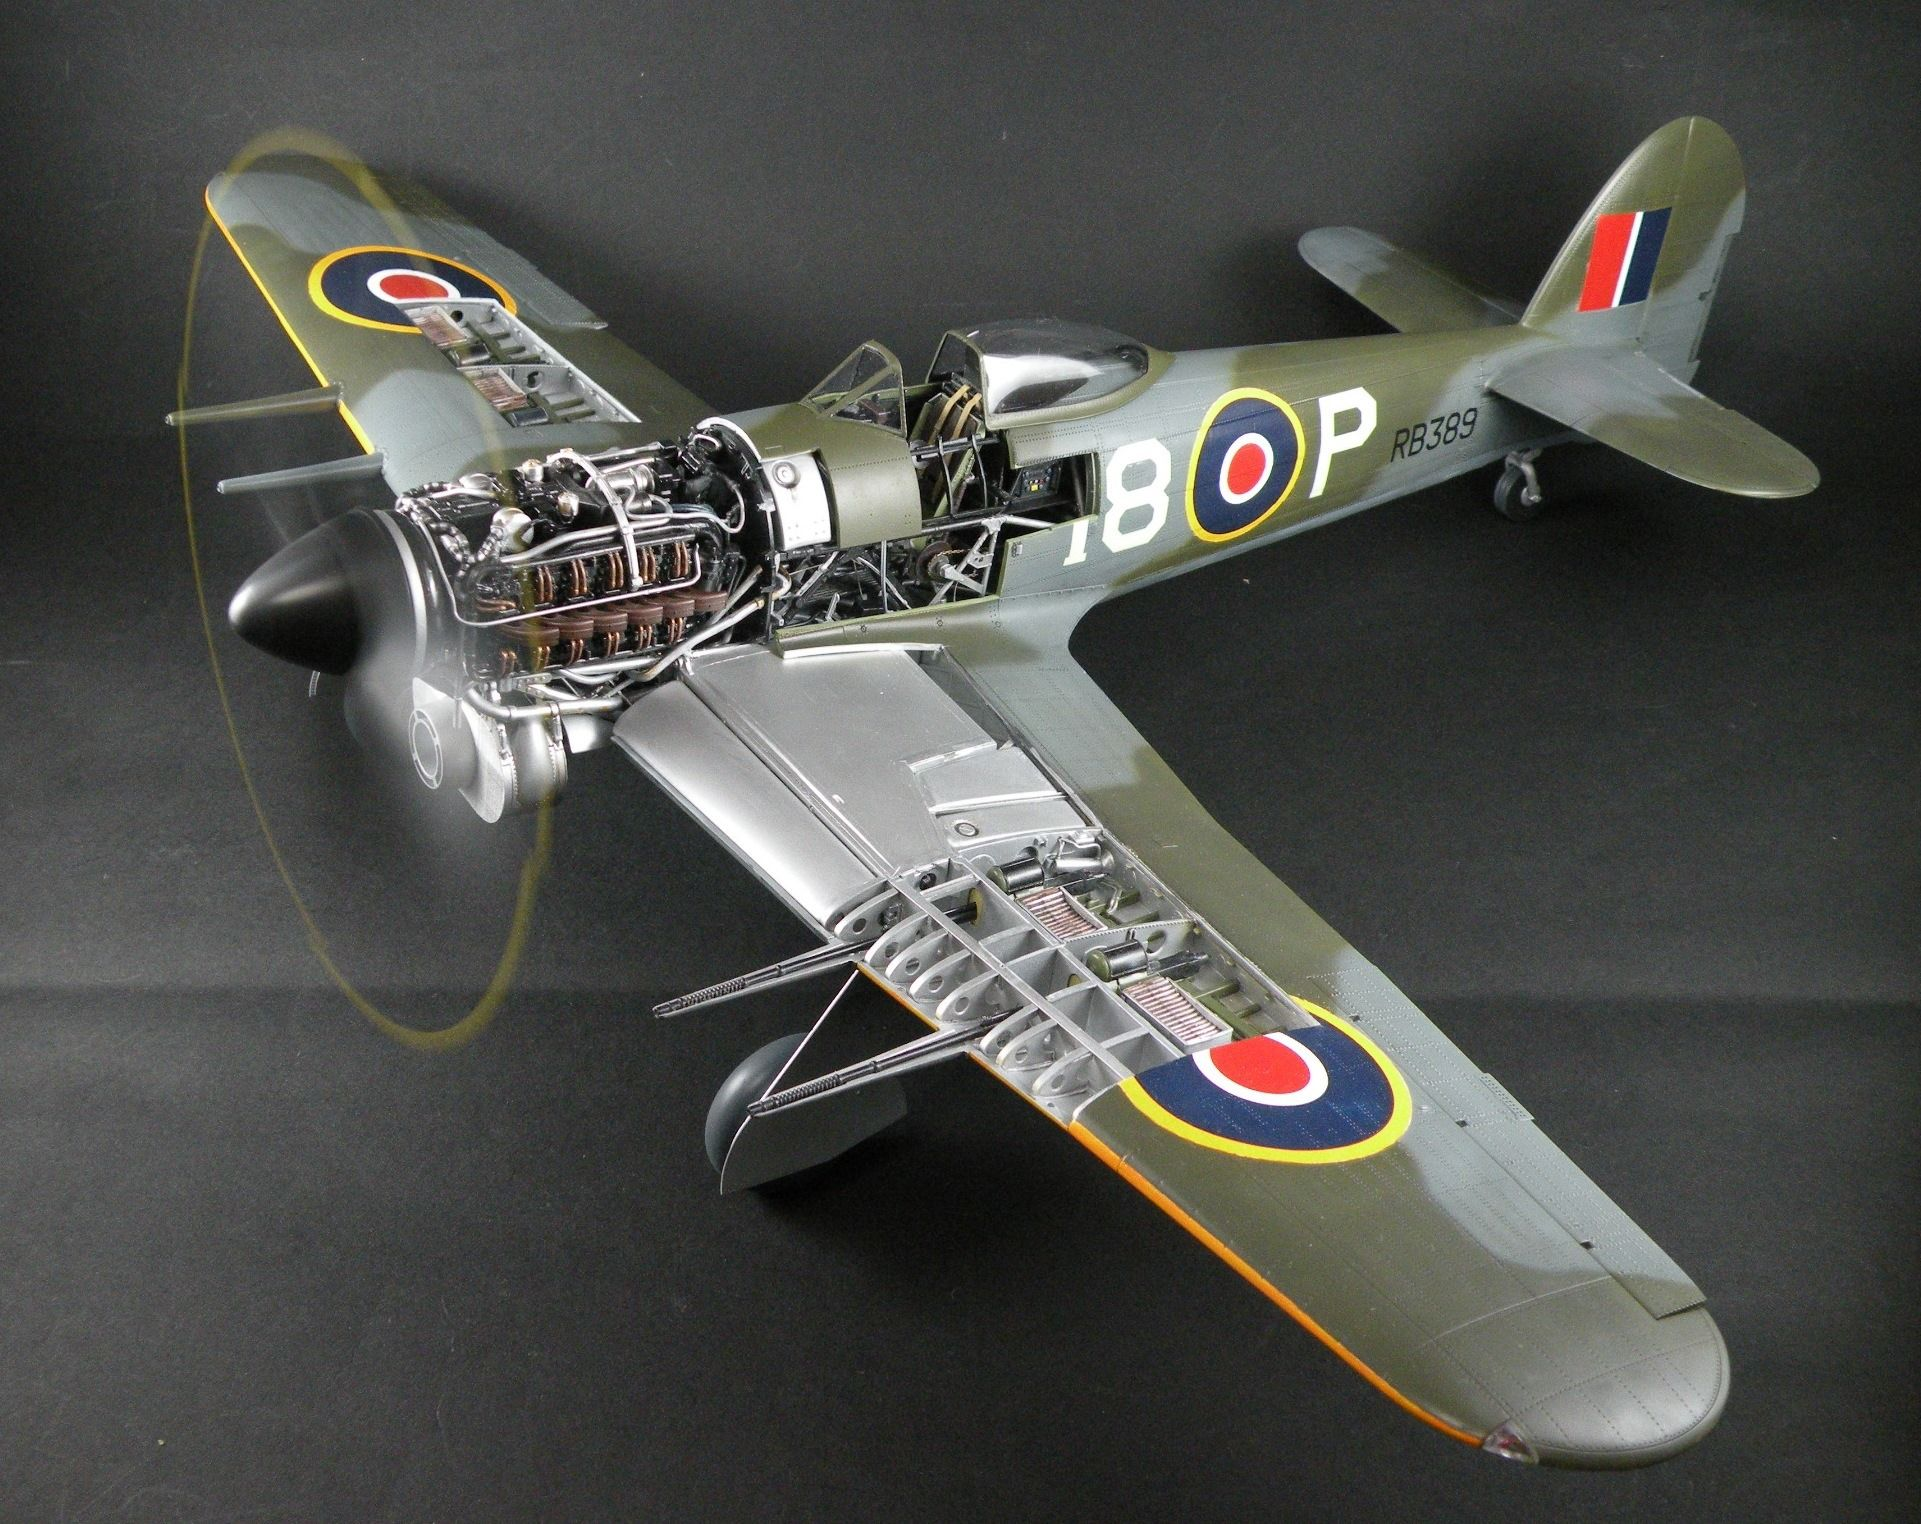 Pin By Rocketfin Hobbies On Aircraft Models Model